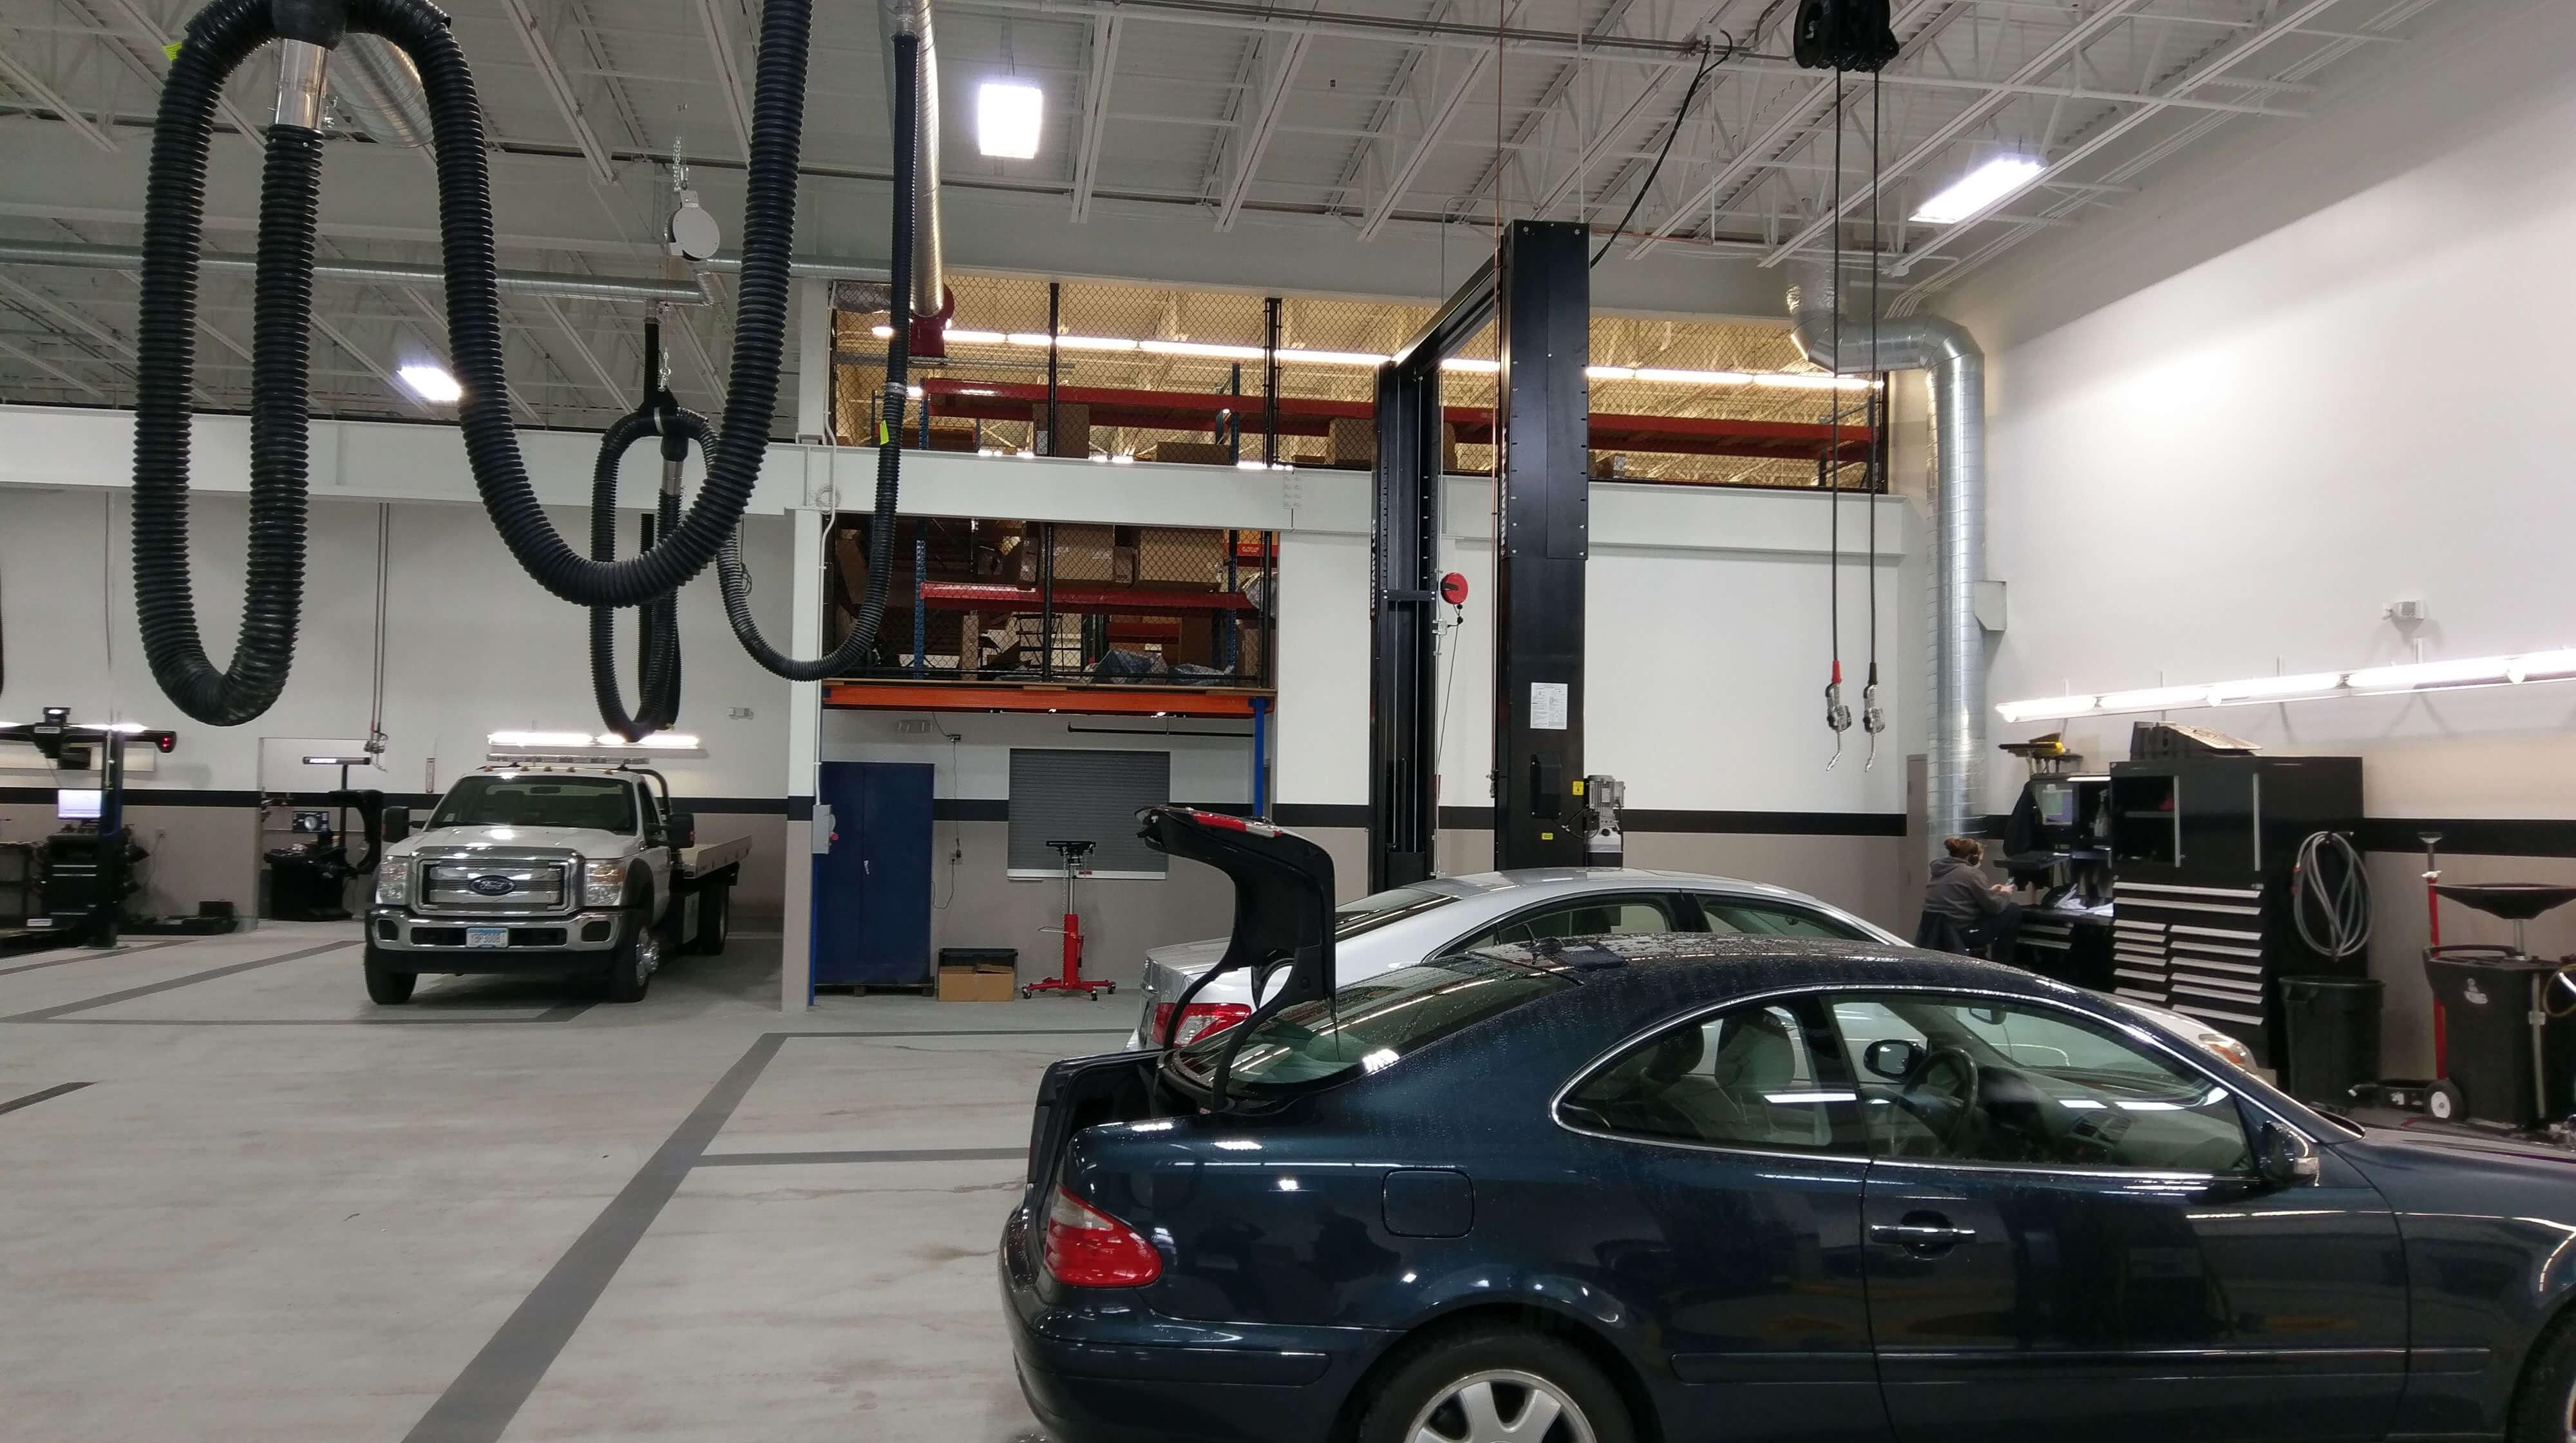 mercedes-benz metris service center